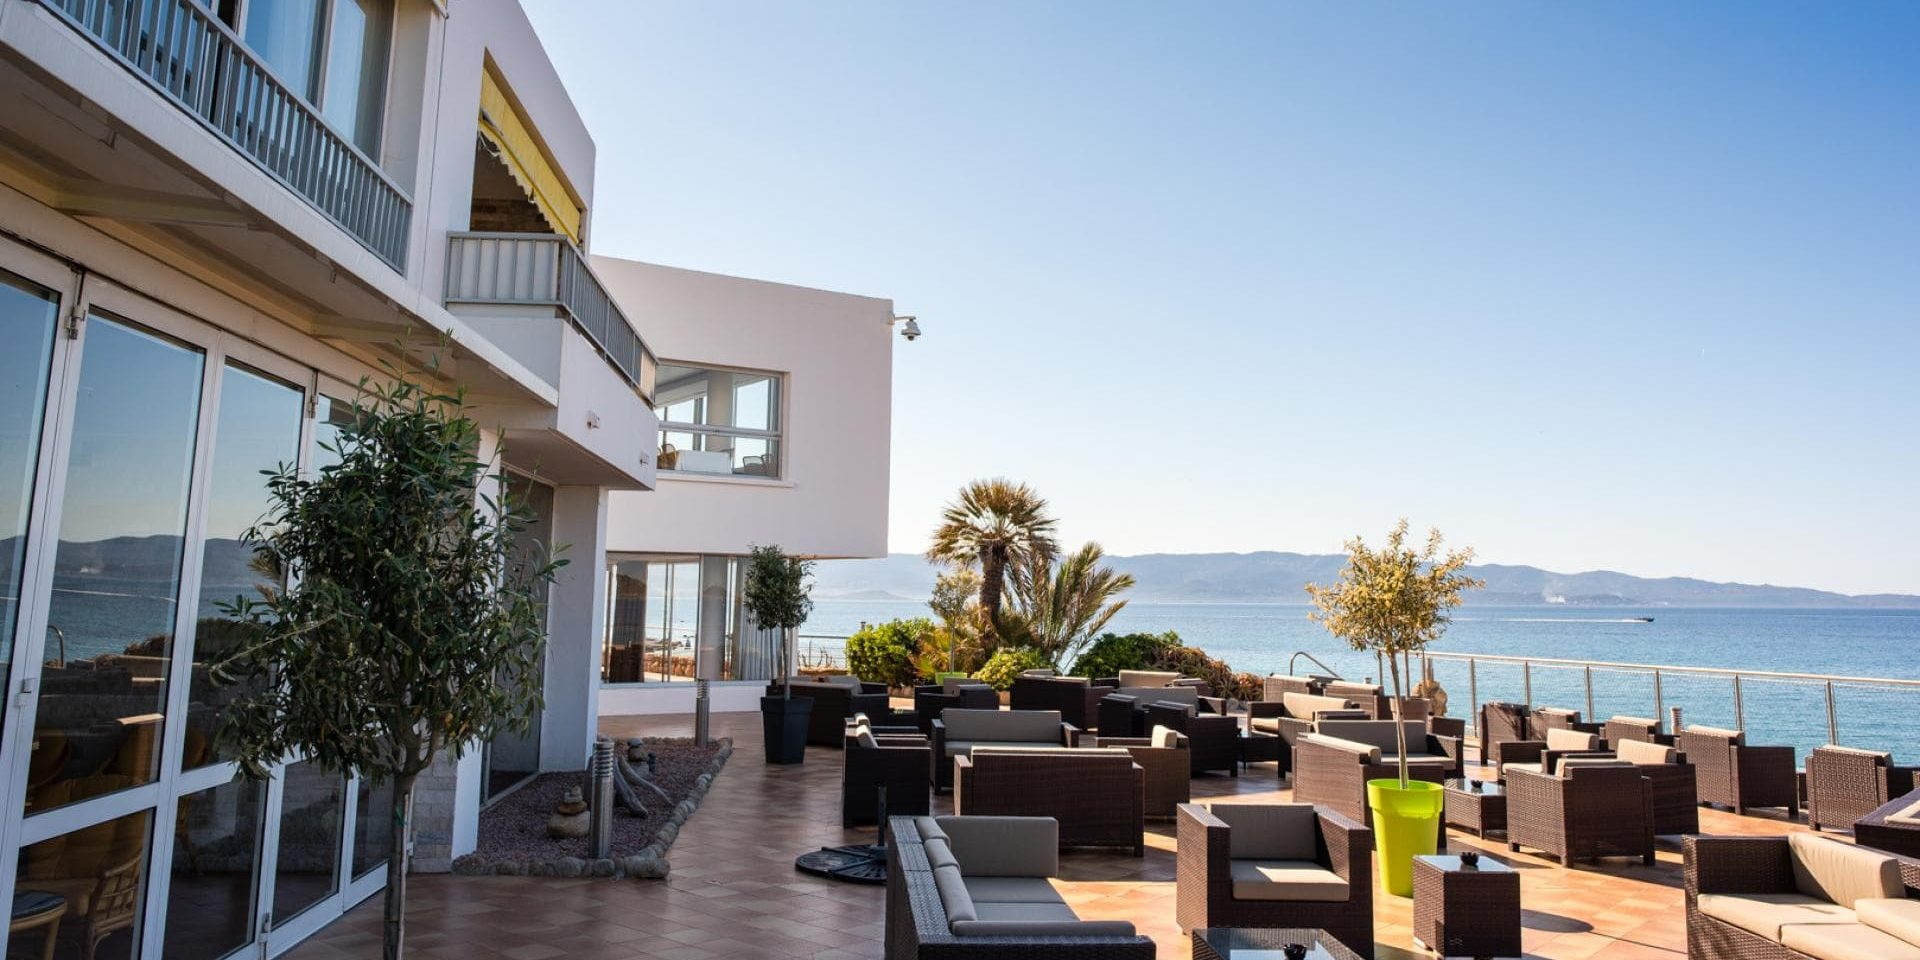 Hotel Cala di Sole Ajaccio Corsica Frankrijk lounge terras zeezicht achterzijde